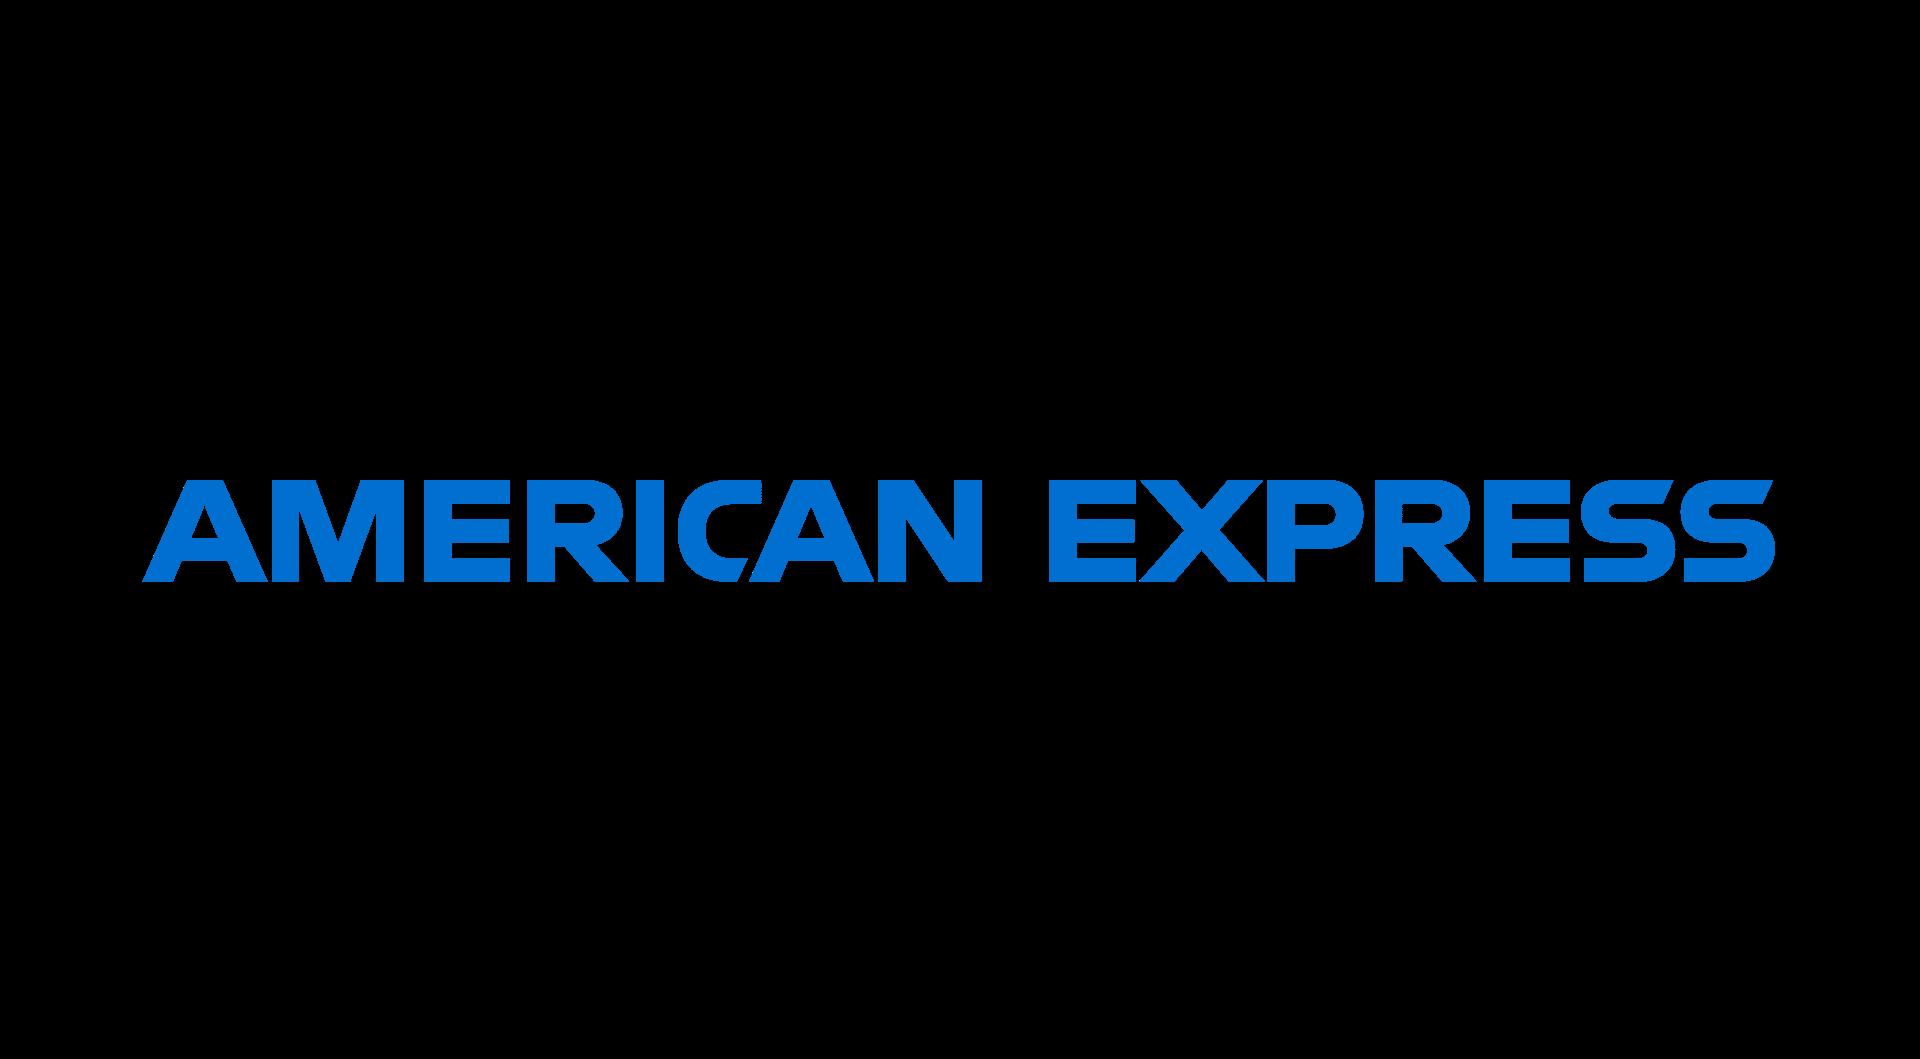 American-Express-Logotype-Single-Line